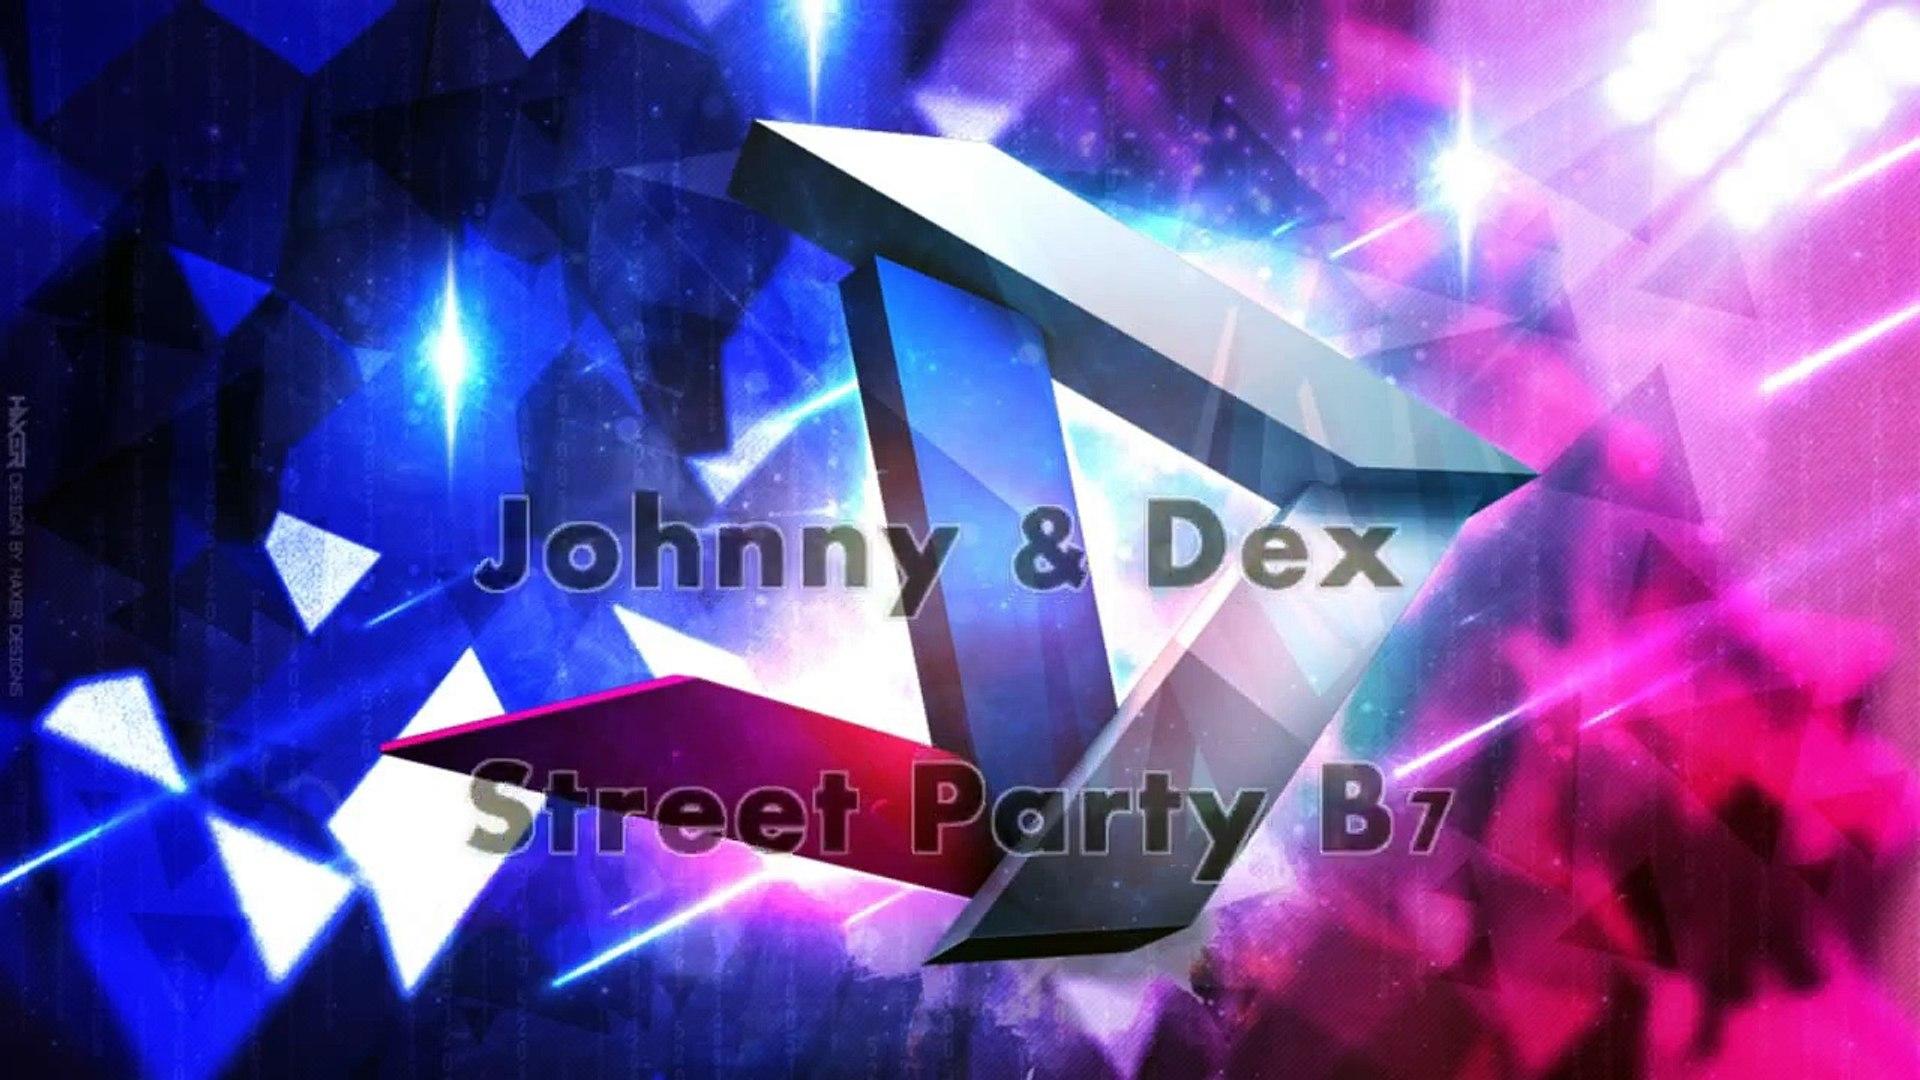 Johnny & Dex - Street party B7 28/10/13